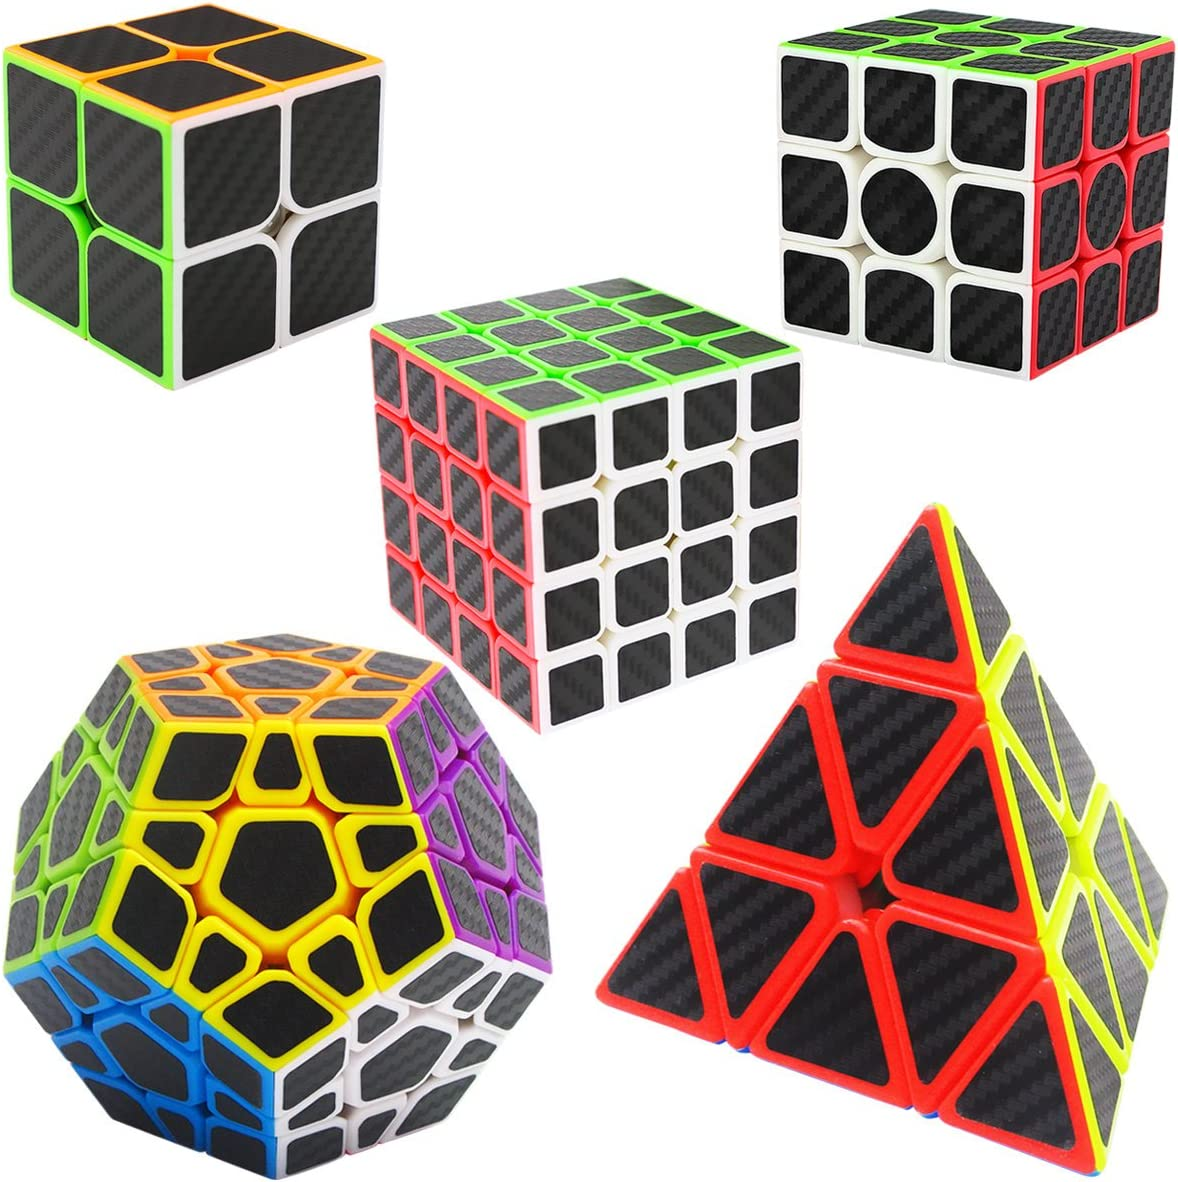 LSMY Speed Cubes 2x2x2 + 3x3x3 + 4x4x4 + Pyraminx + Megaminx, 5 Pack Puzzle Mágico Cubo Carbon Fiber Sticker Toy